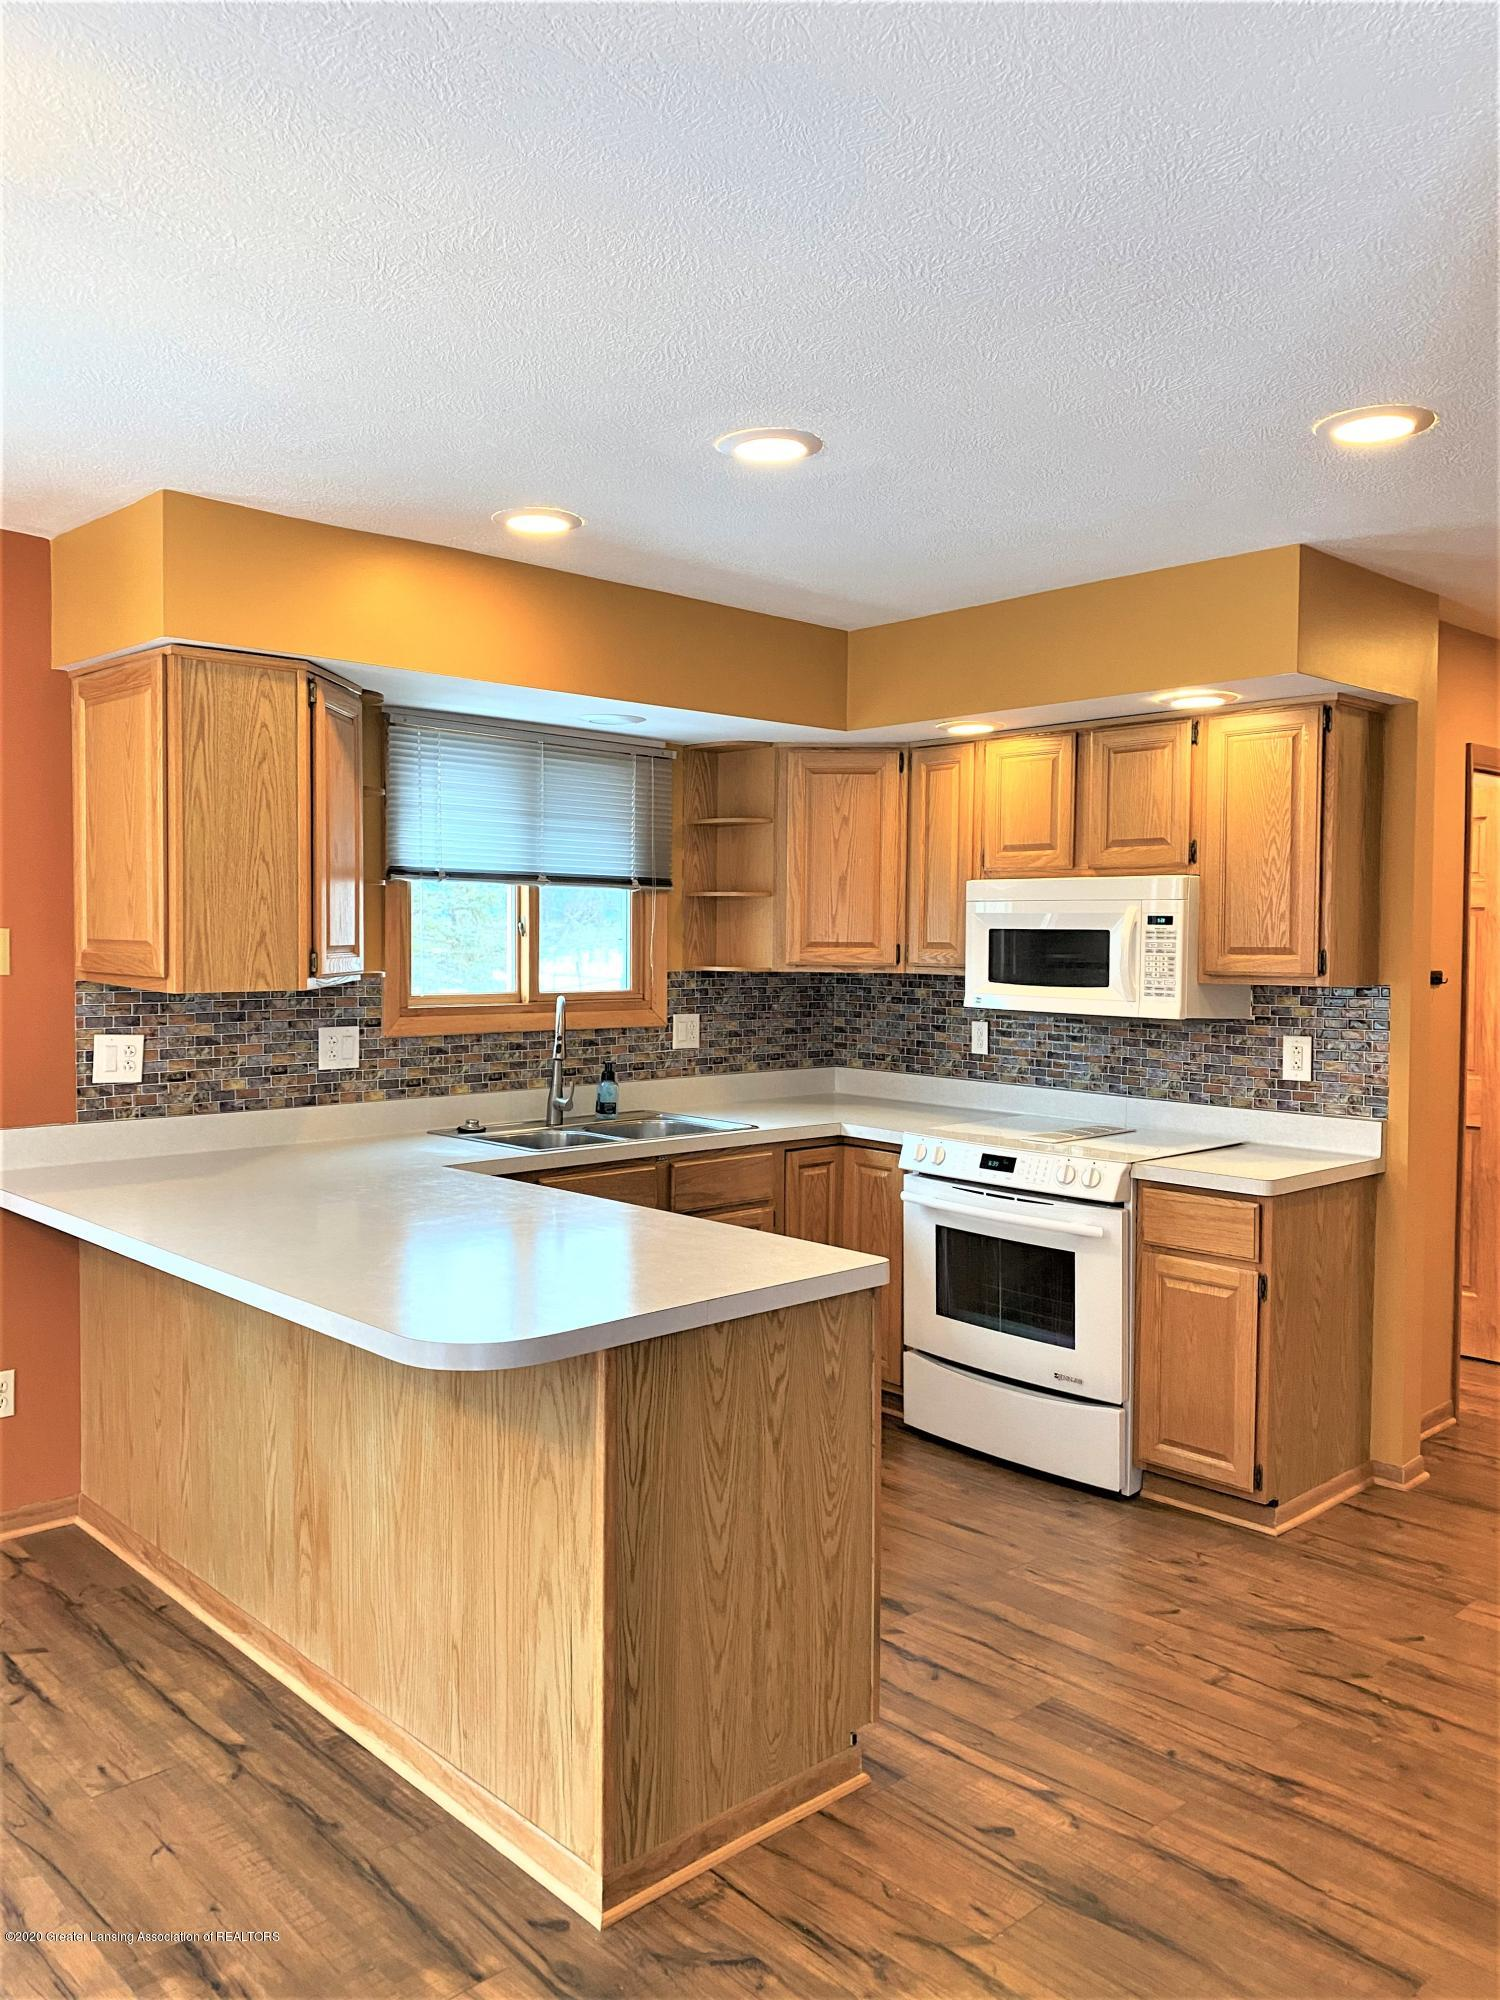 2475 Walenjus Ct - Kitchen 2 - 7